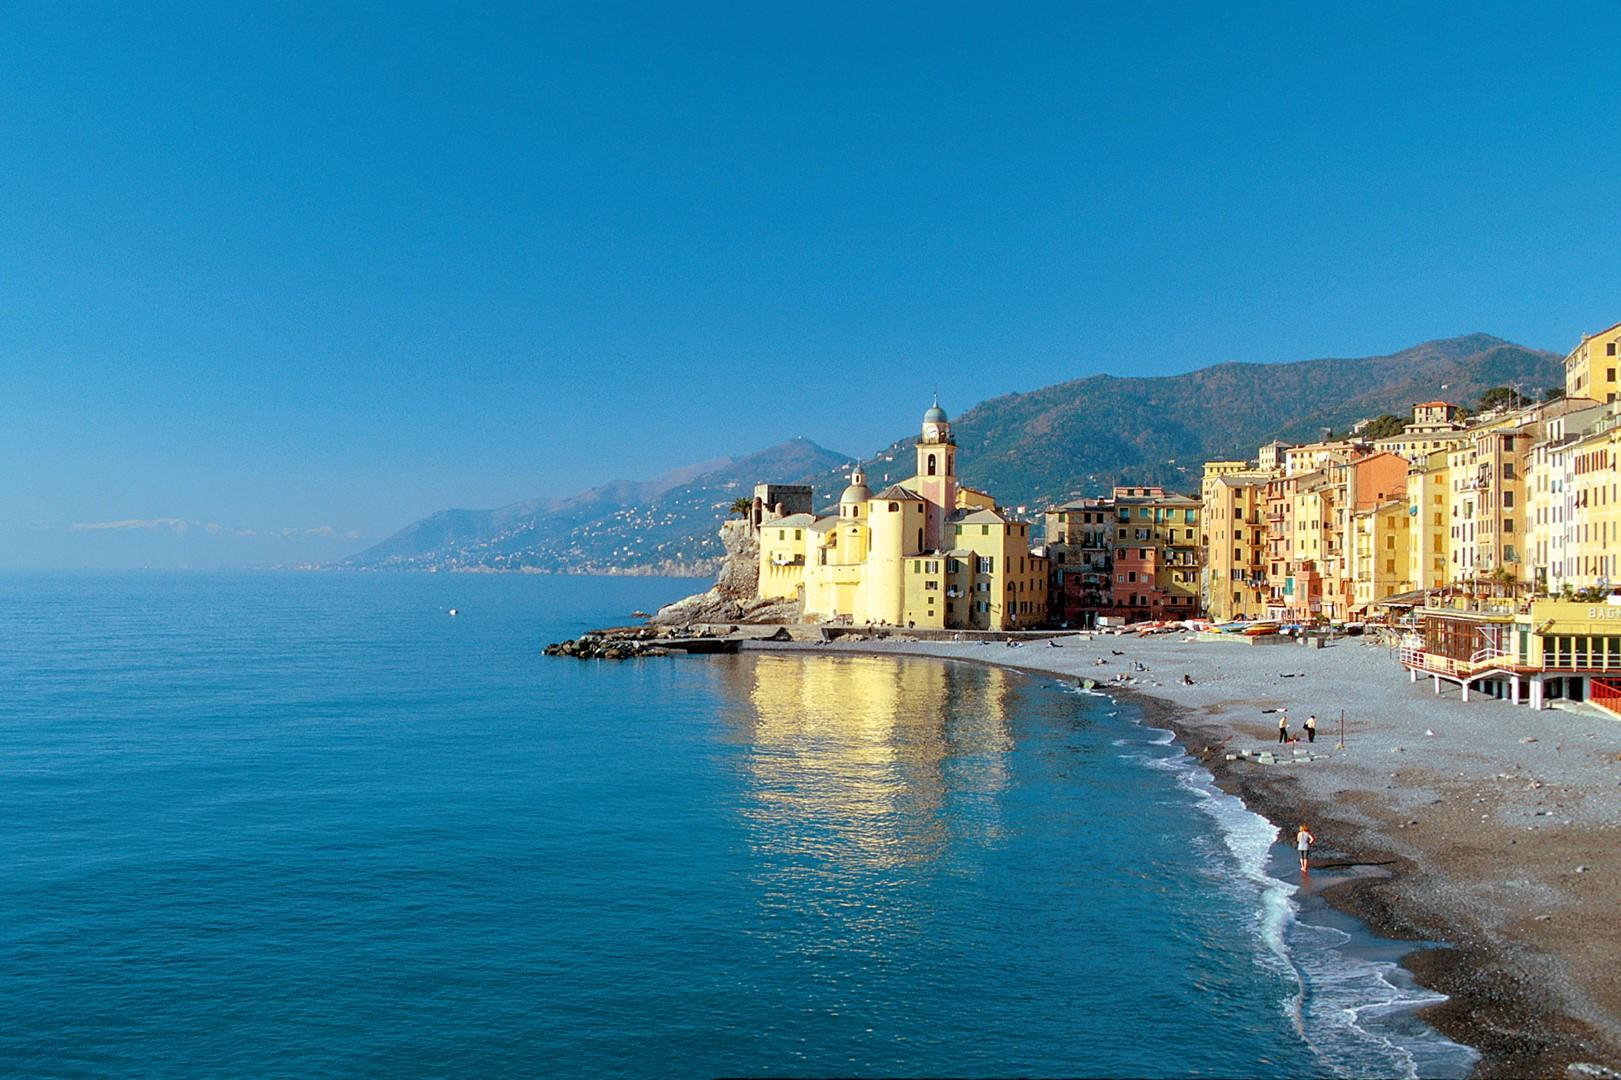 Liguria da record tra bandiere blu, balene e windsurf